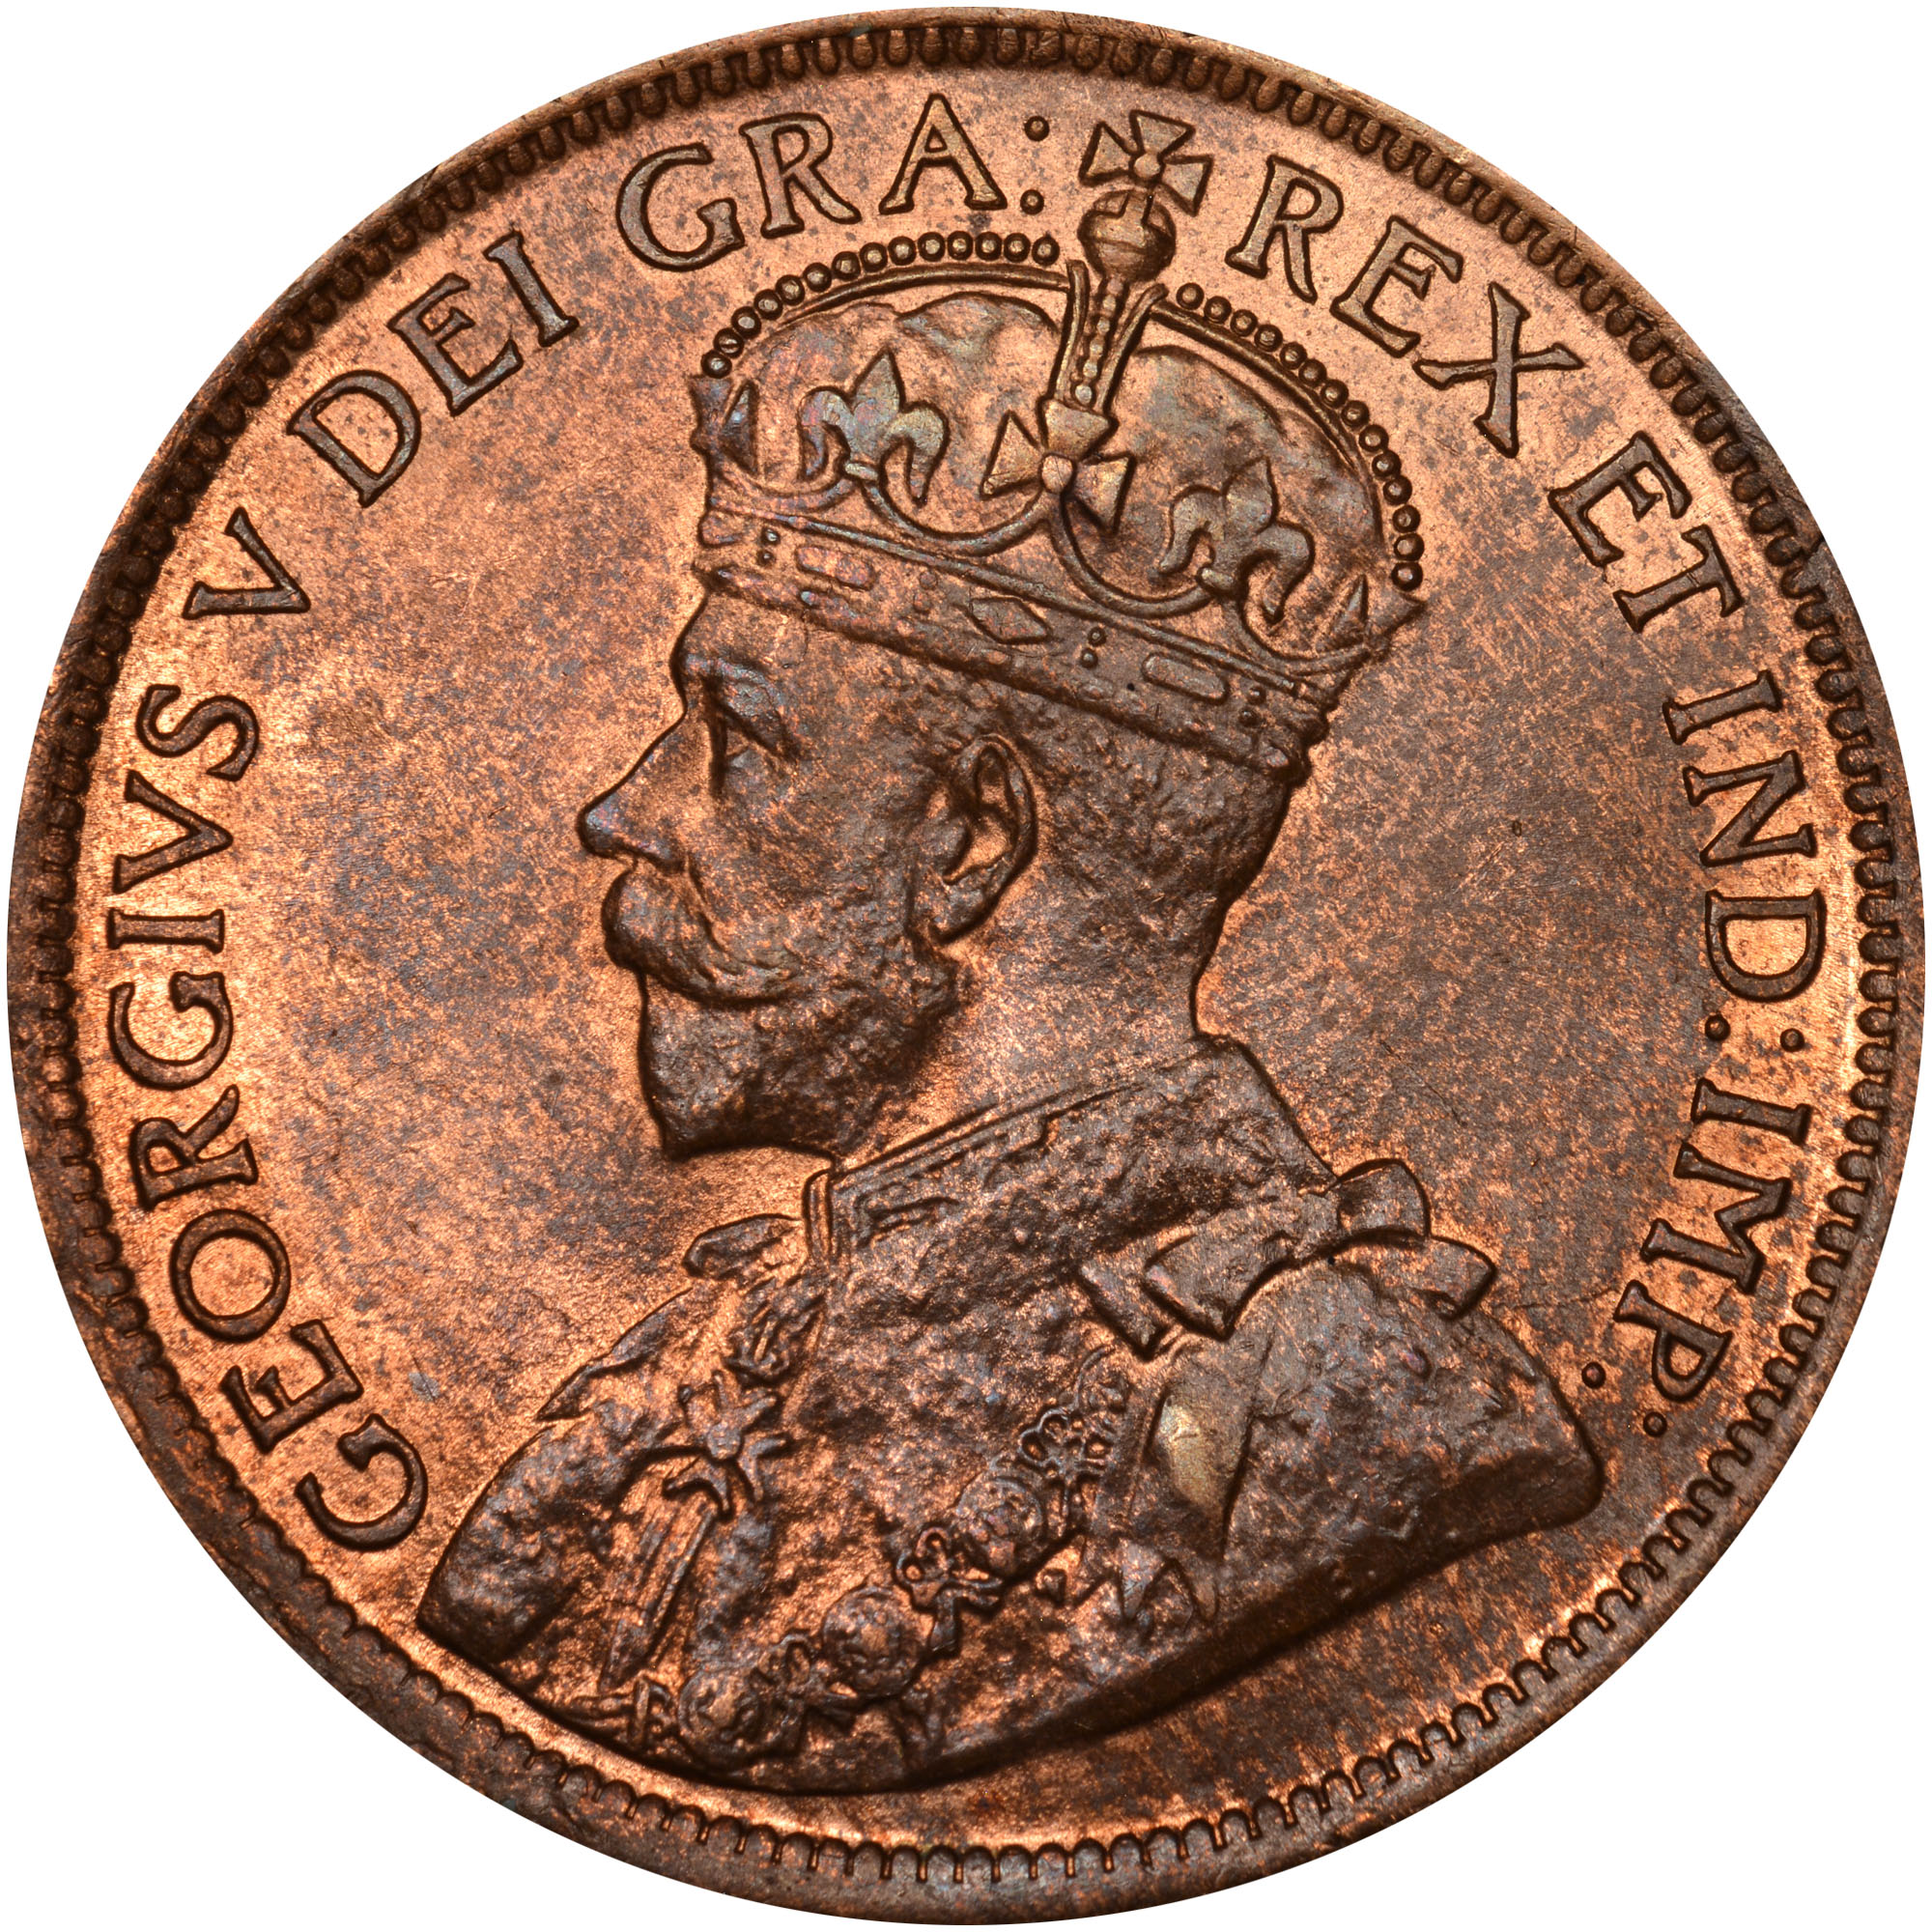 1912-1920 Canada Cent obverse